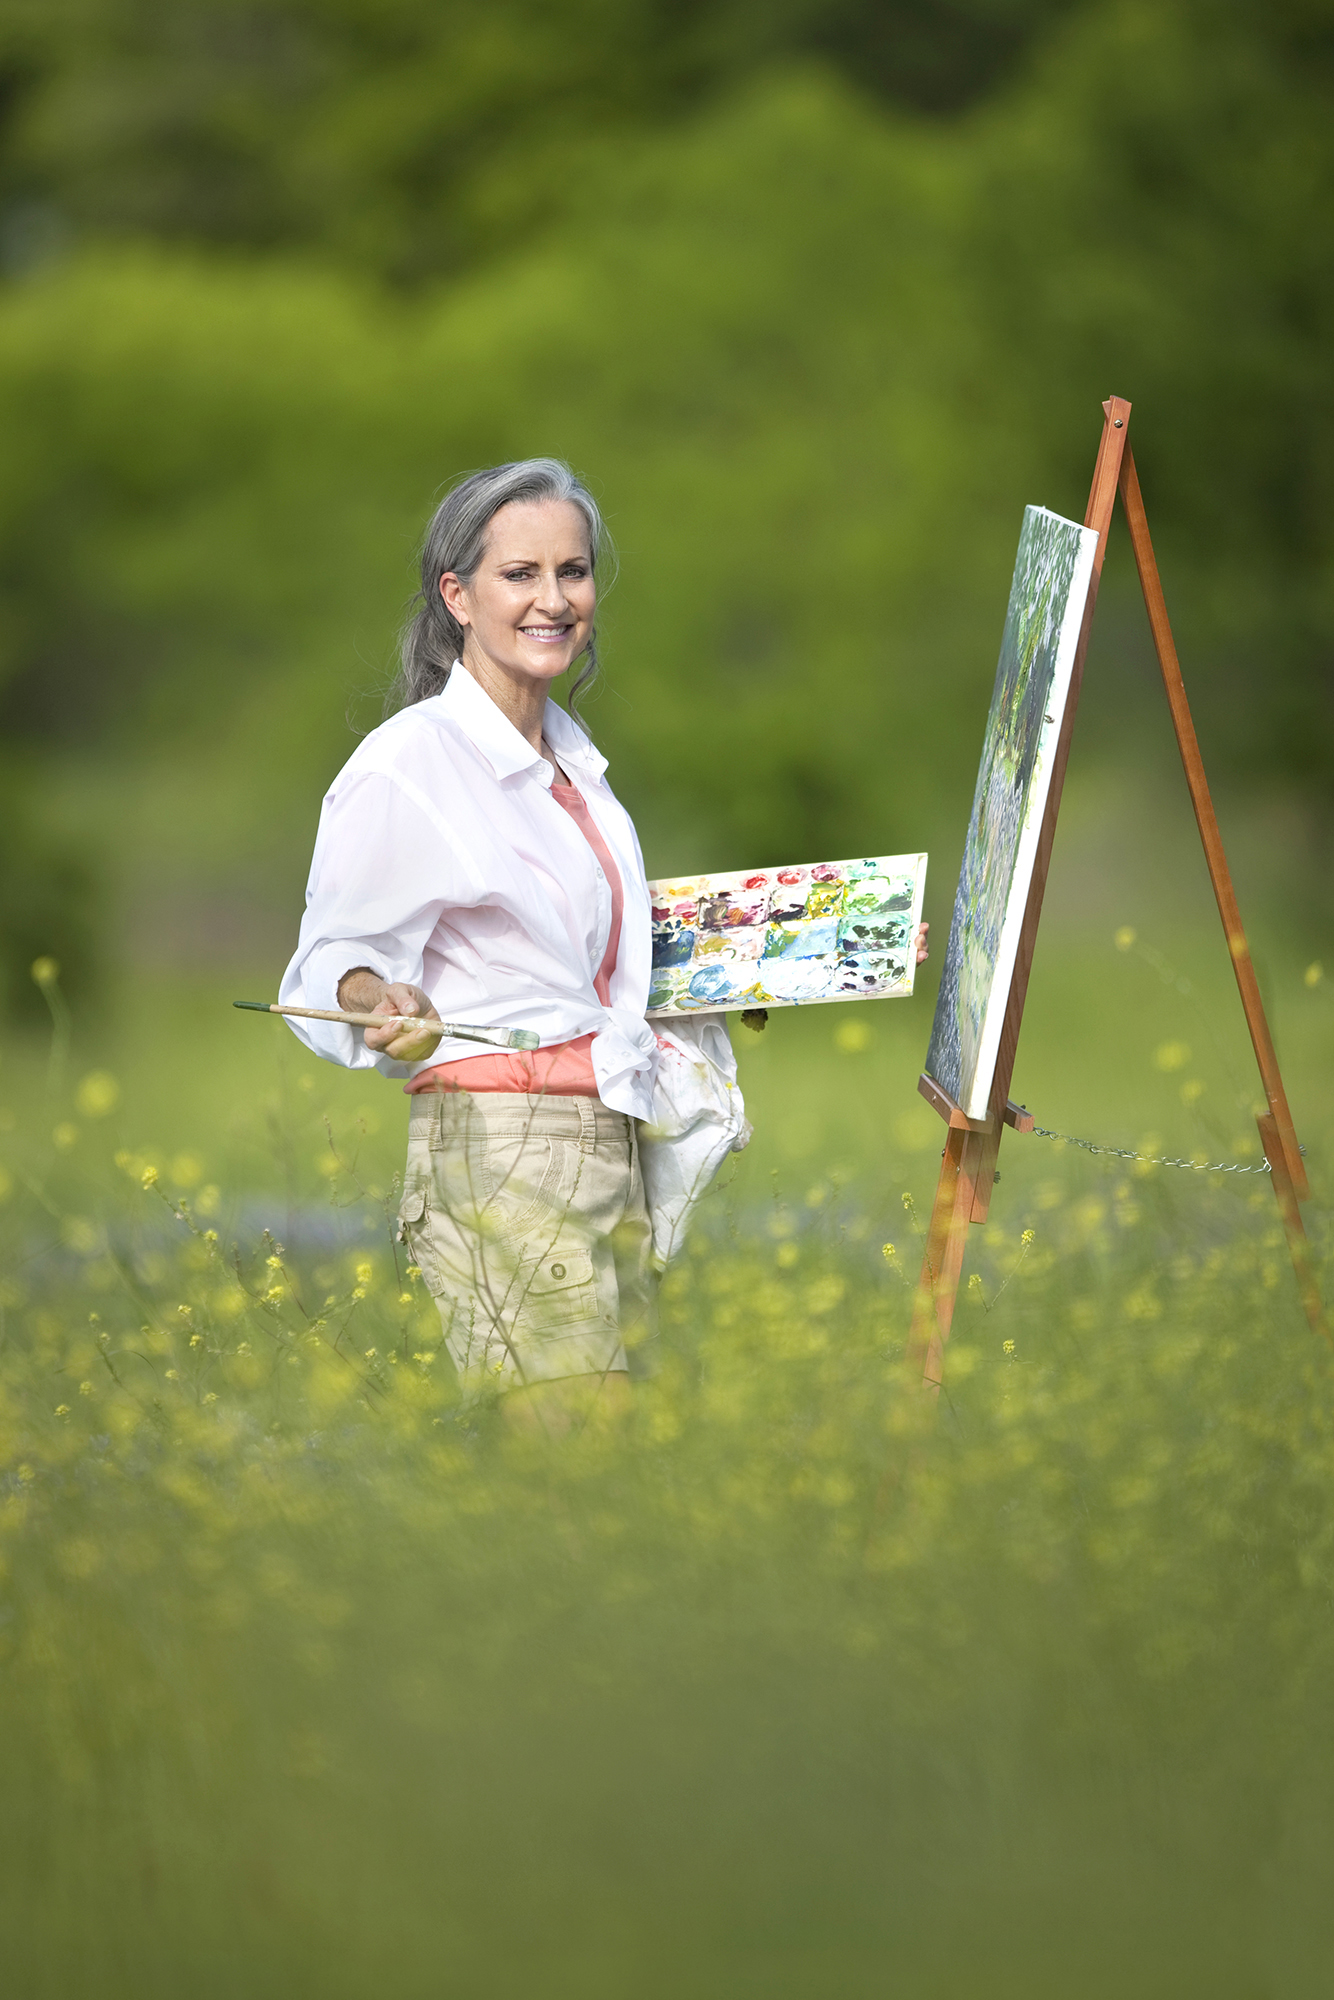 Woman in Wildflower Garden Painting